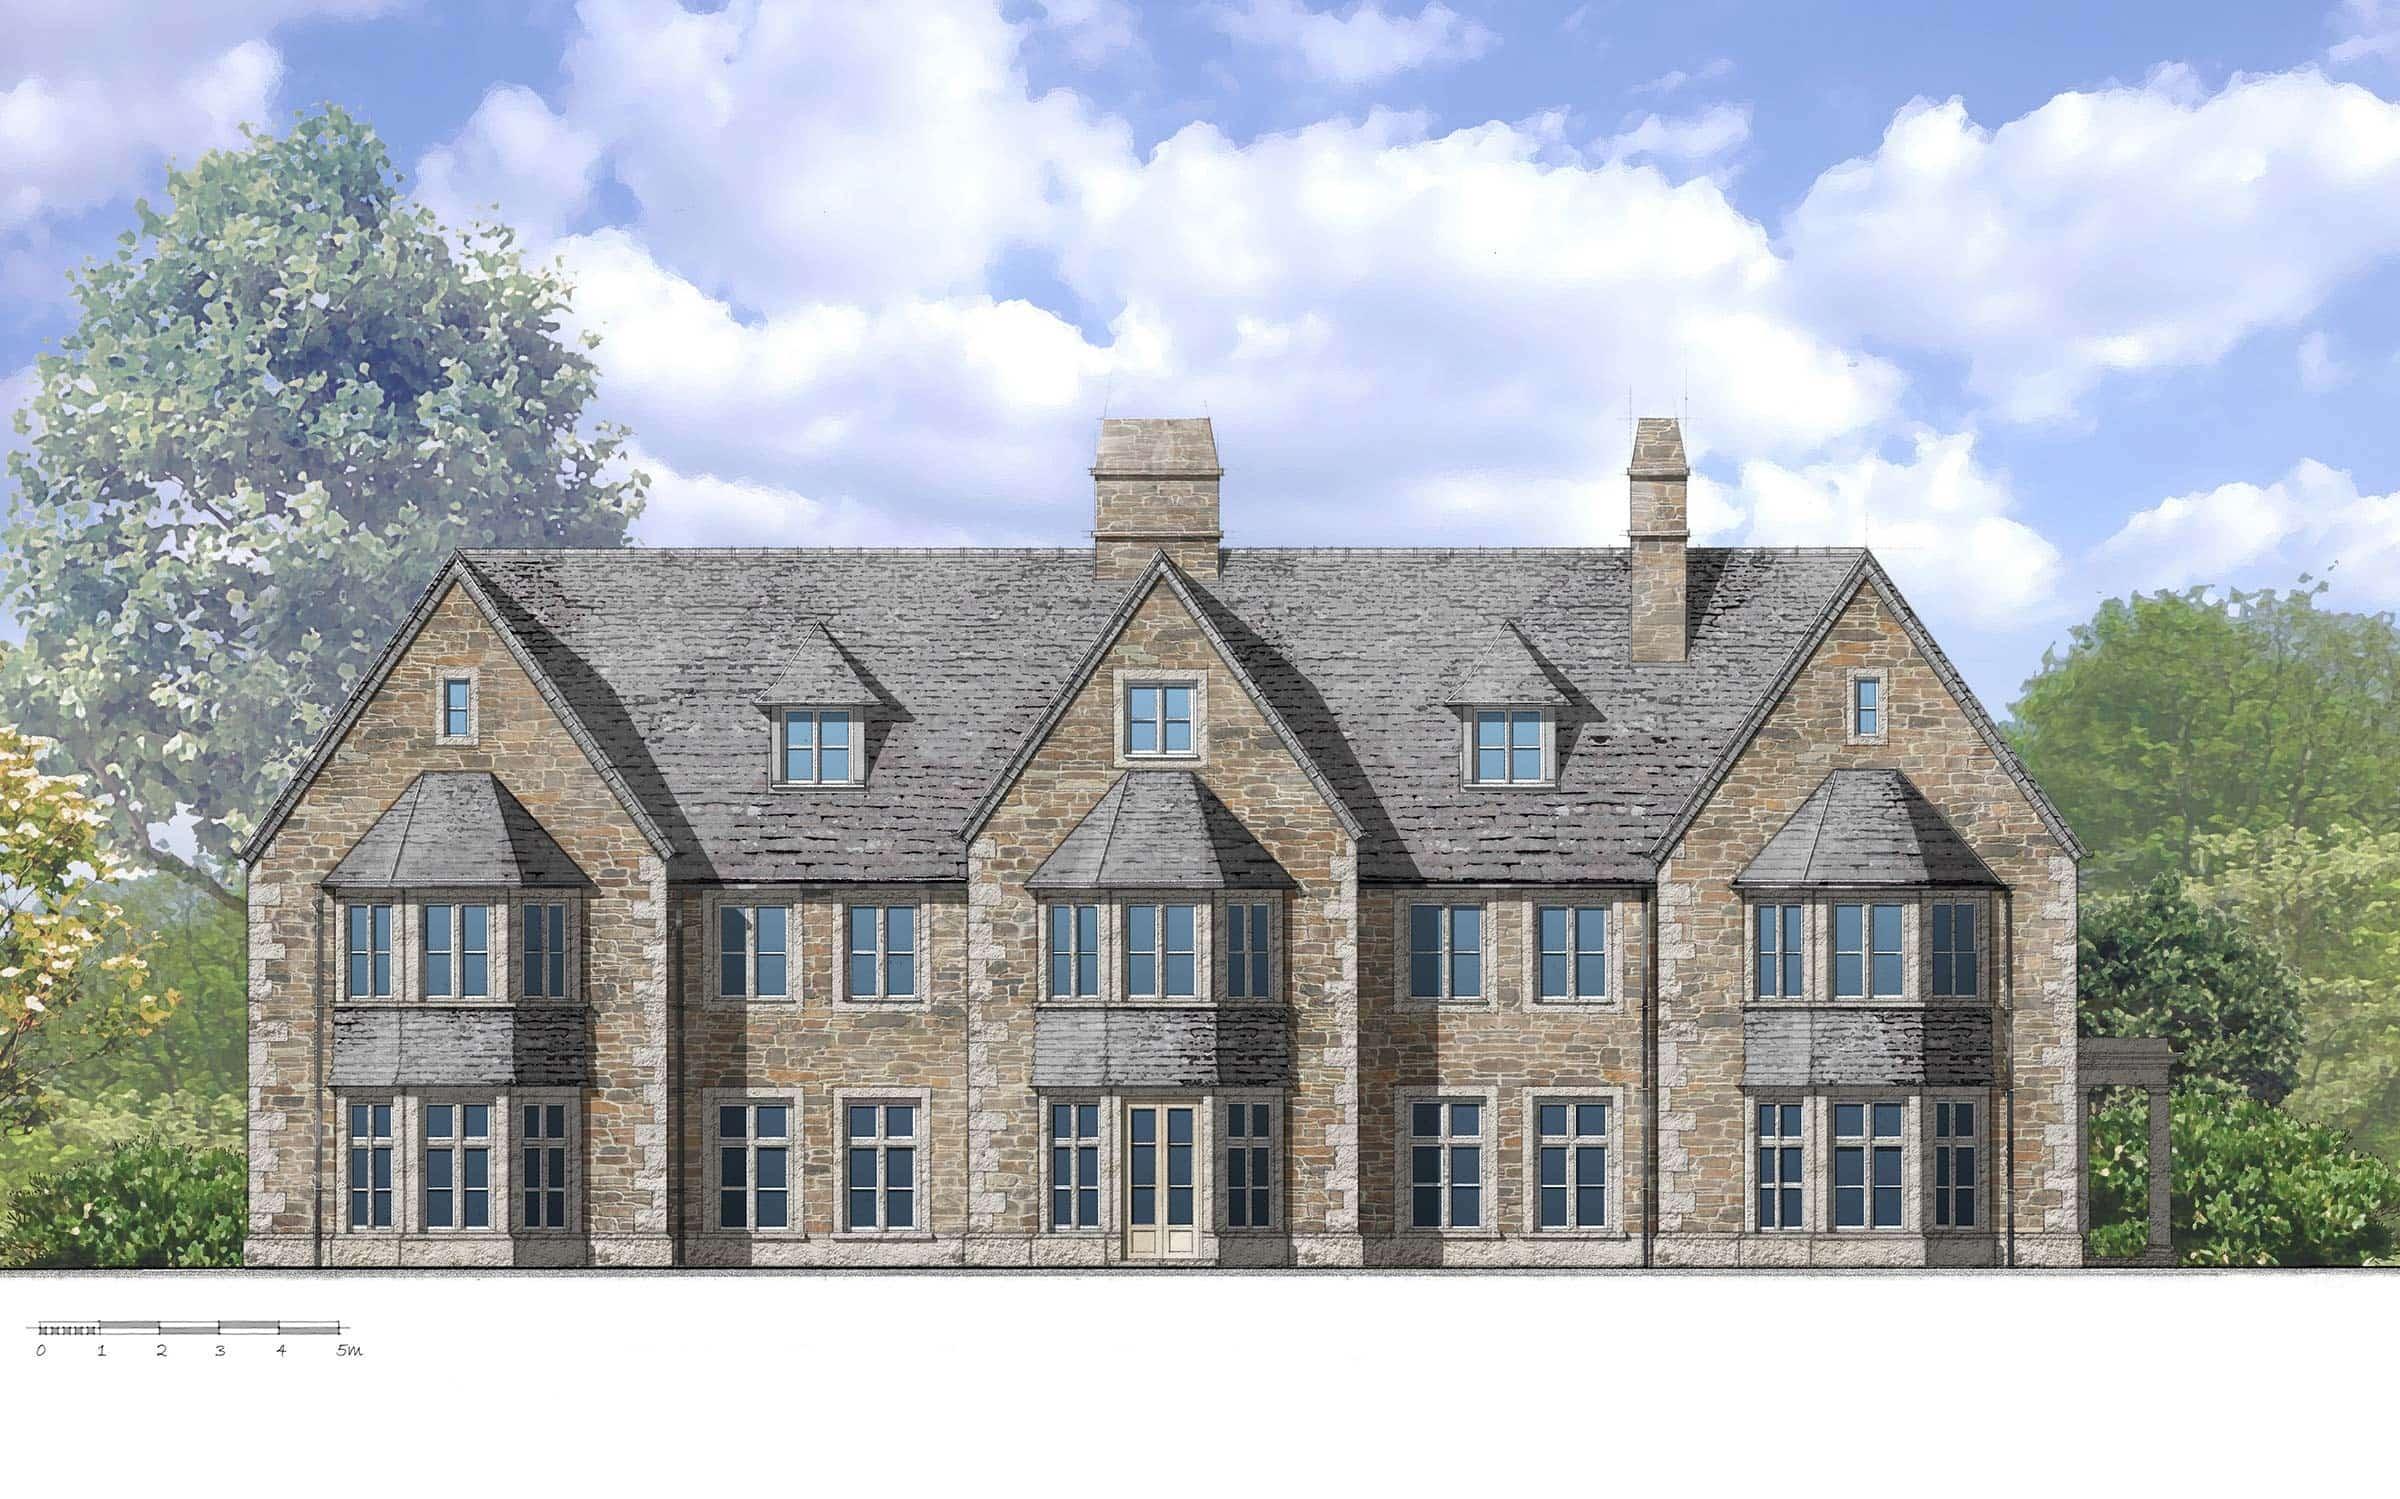 New sustainable Cornish manor house